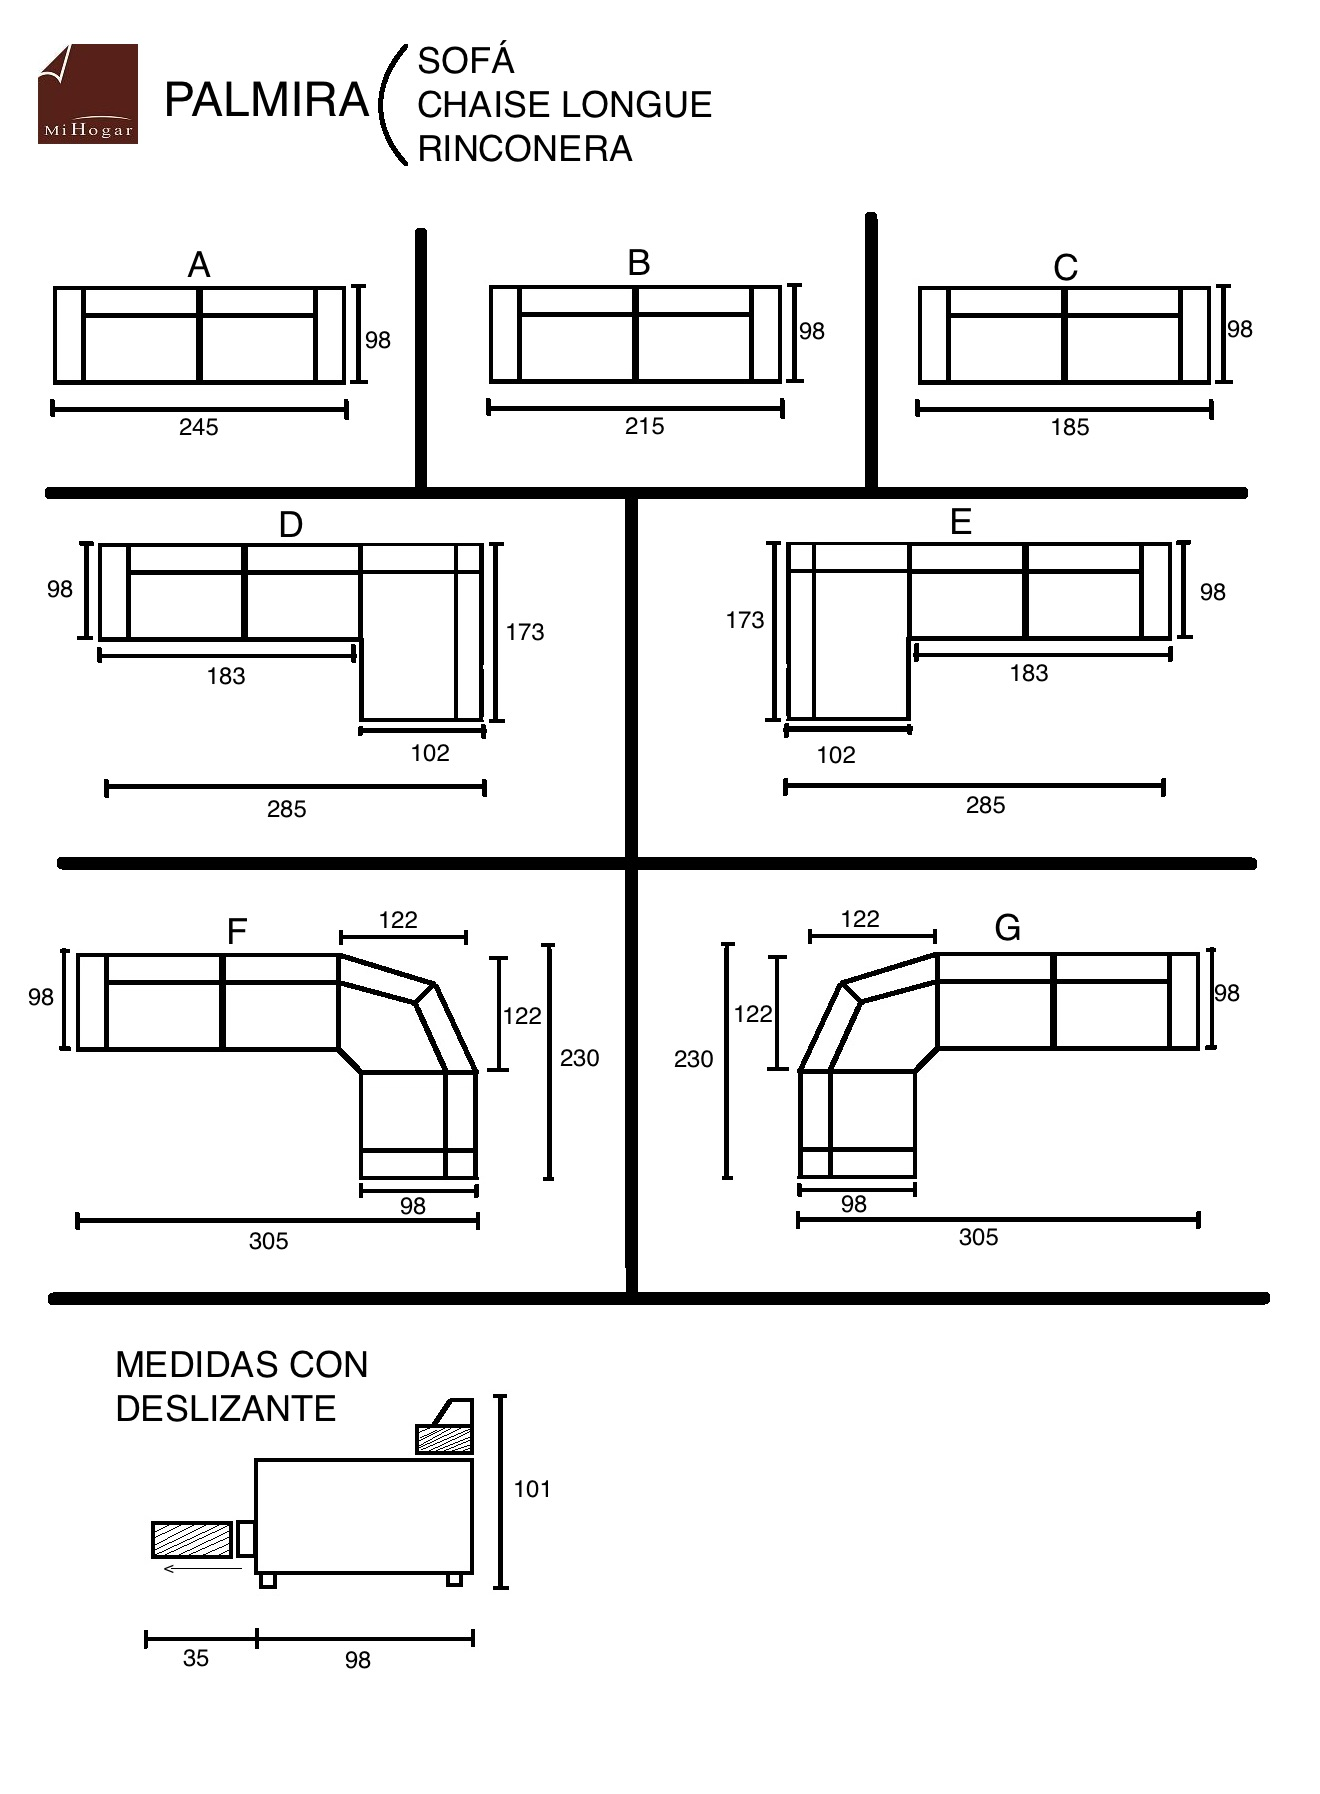 Chaise longue rinconera palmira muebles mi hogar for Medidas sofa cama 2 plazas